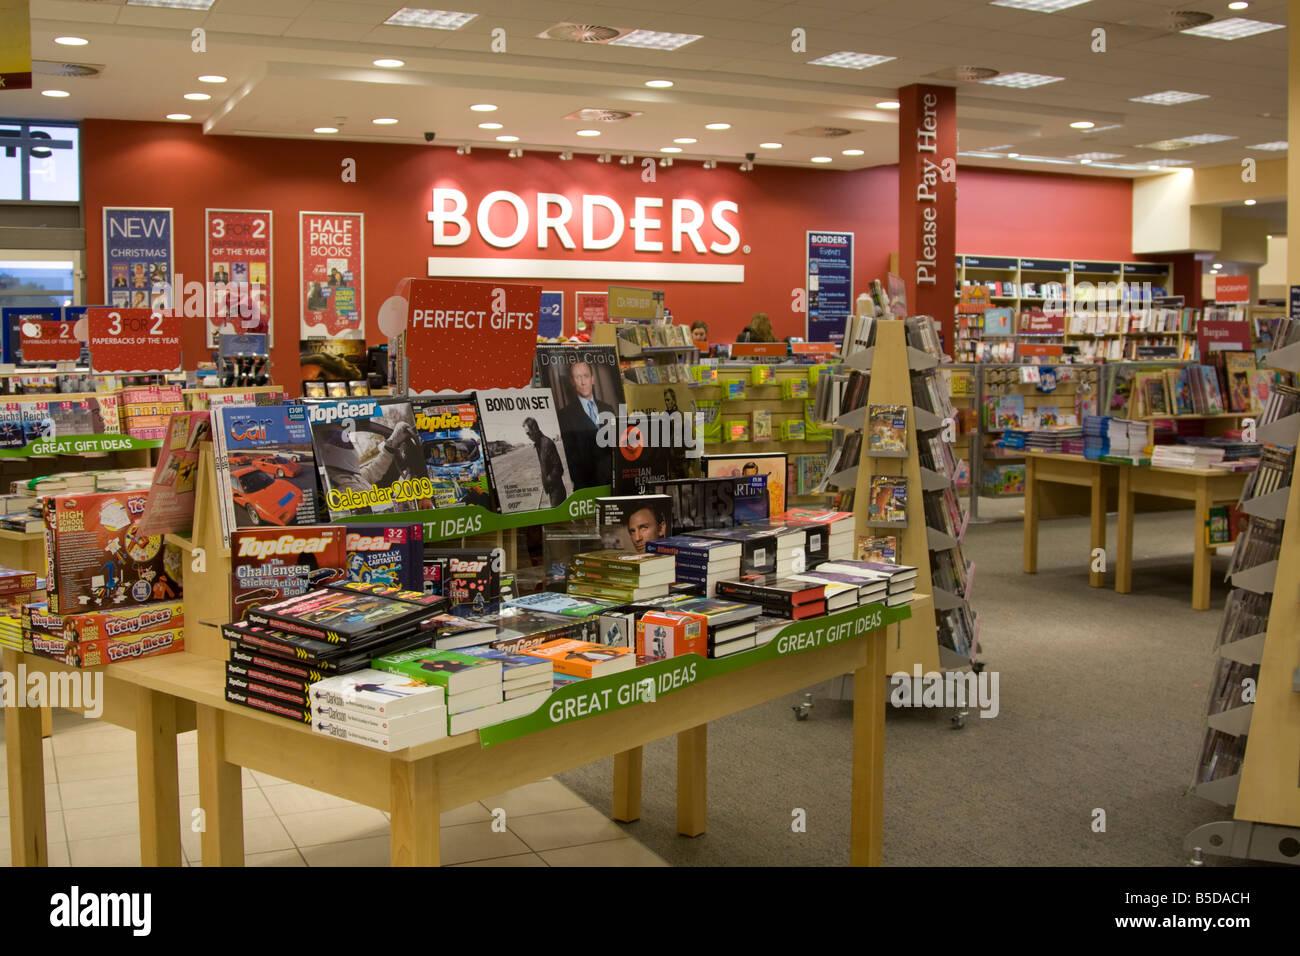 Borders Bookshop Milton Keynes Bucks UK - Stock Image